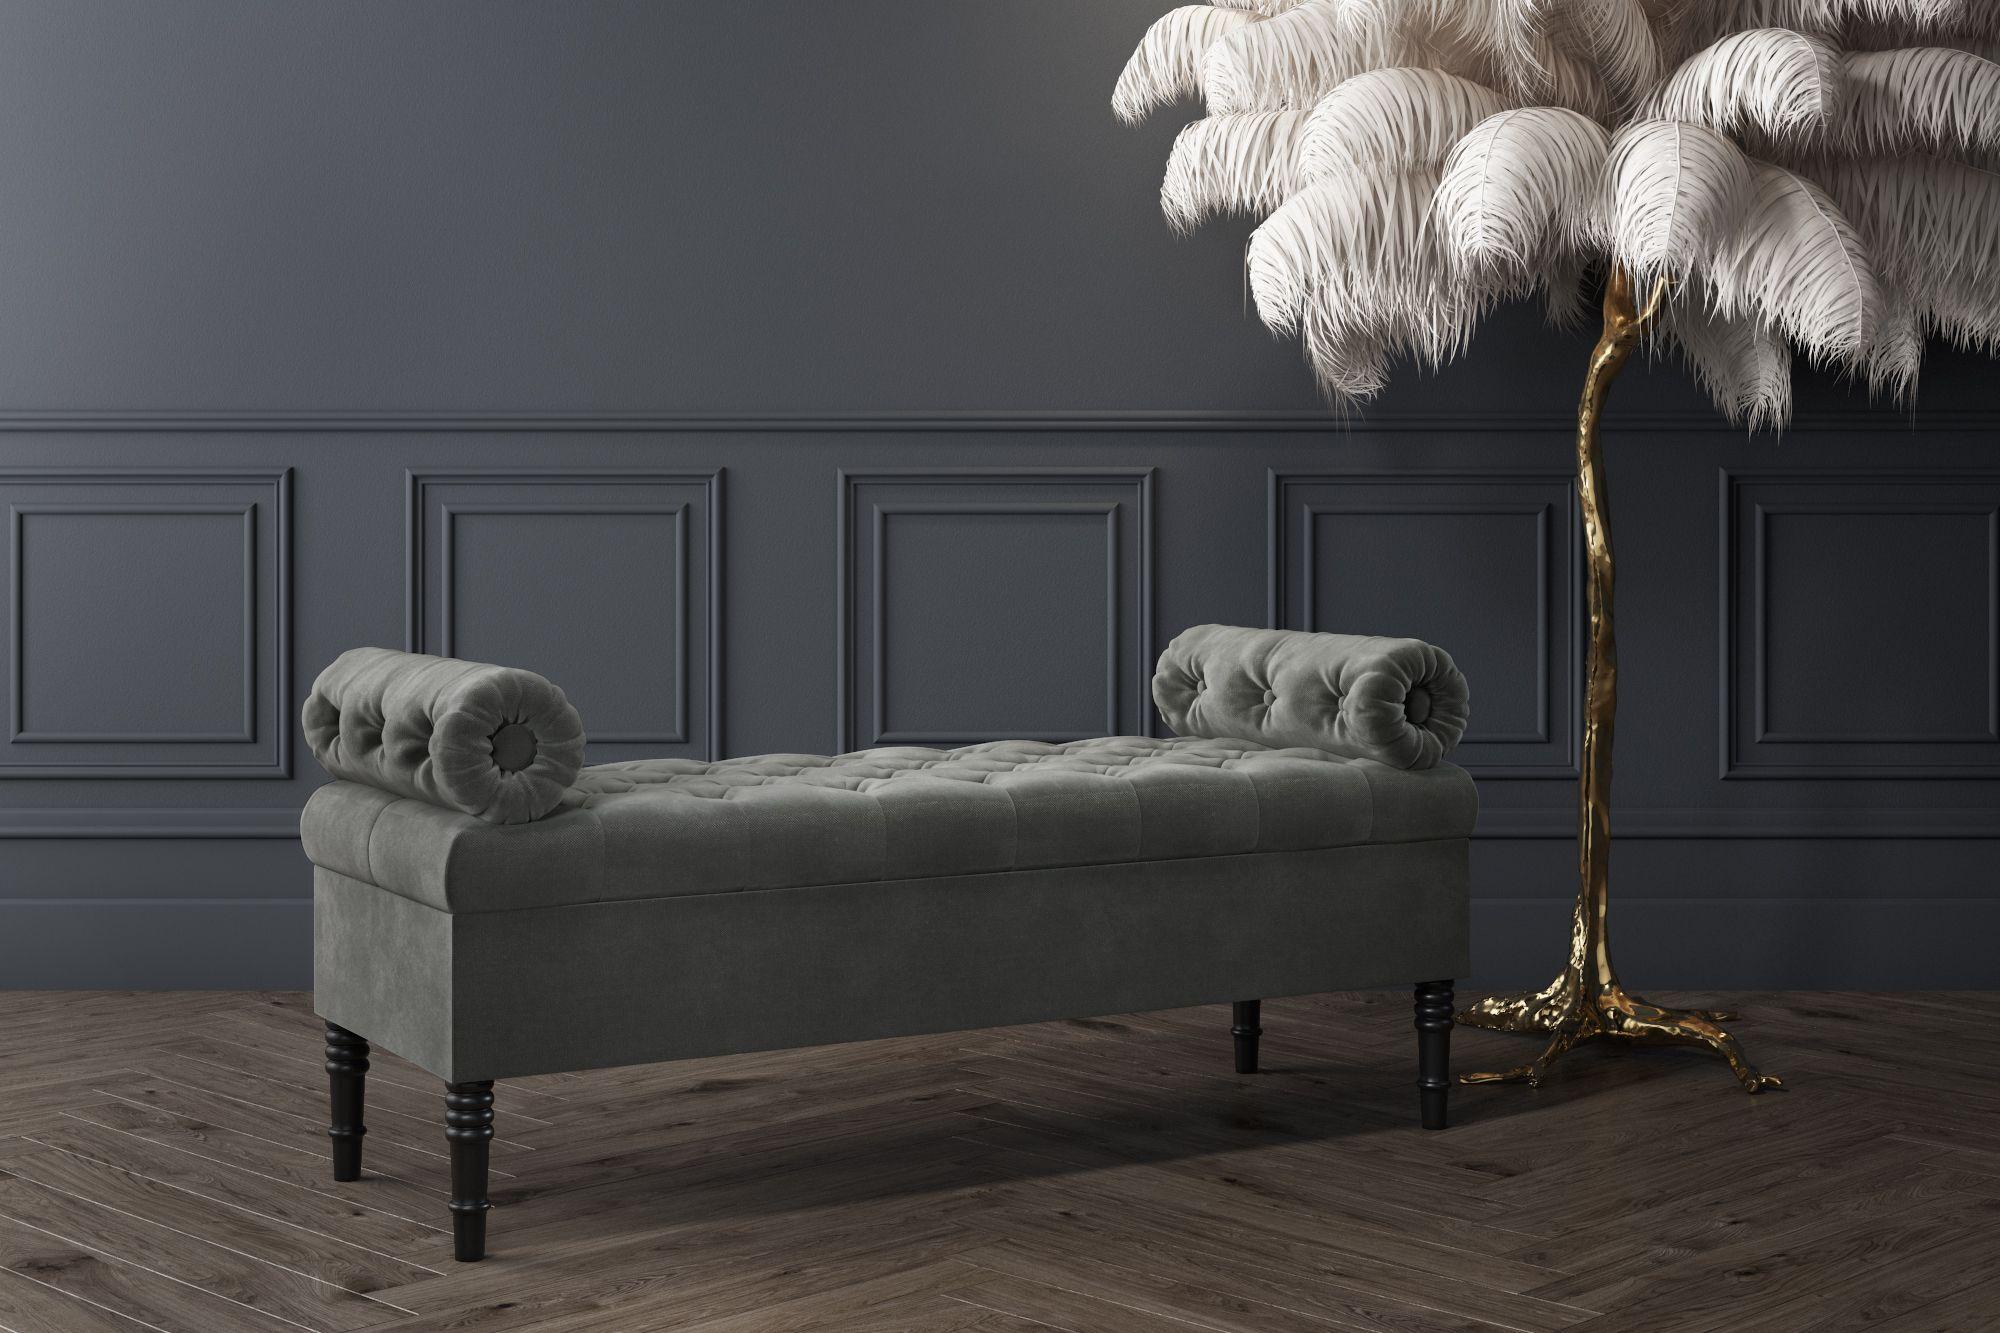 Safina Grey Velvet Ottoman Storage Bench Storage Ottoman Bench Pink Bedroom Furniture End Of Bed Ottoman